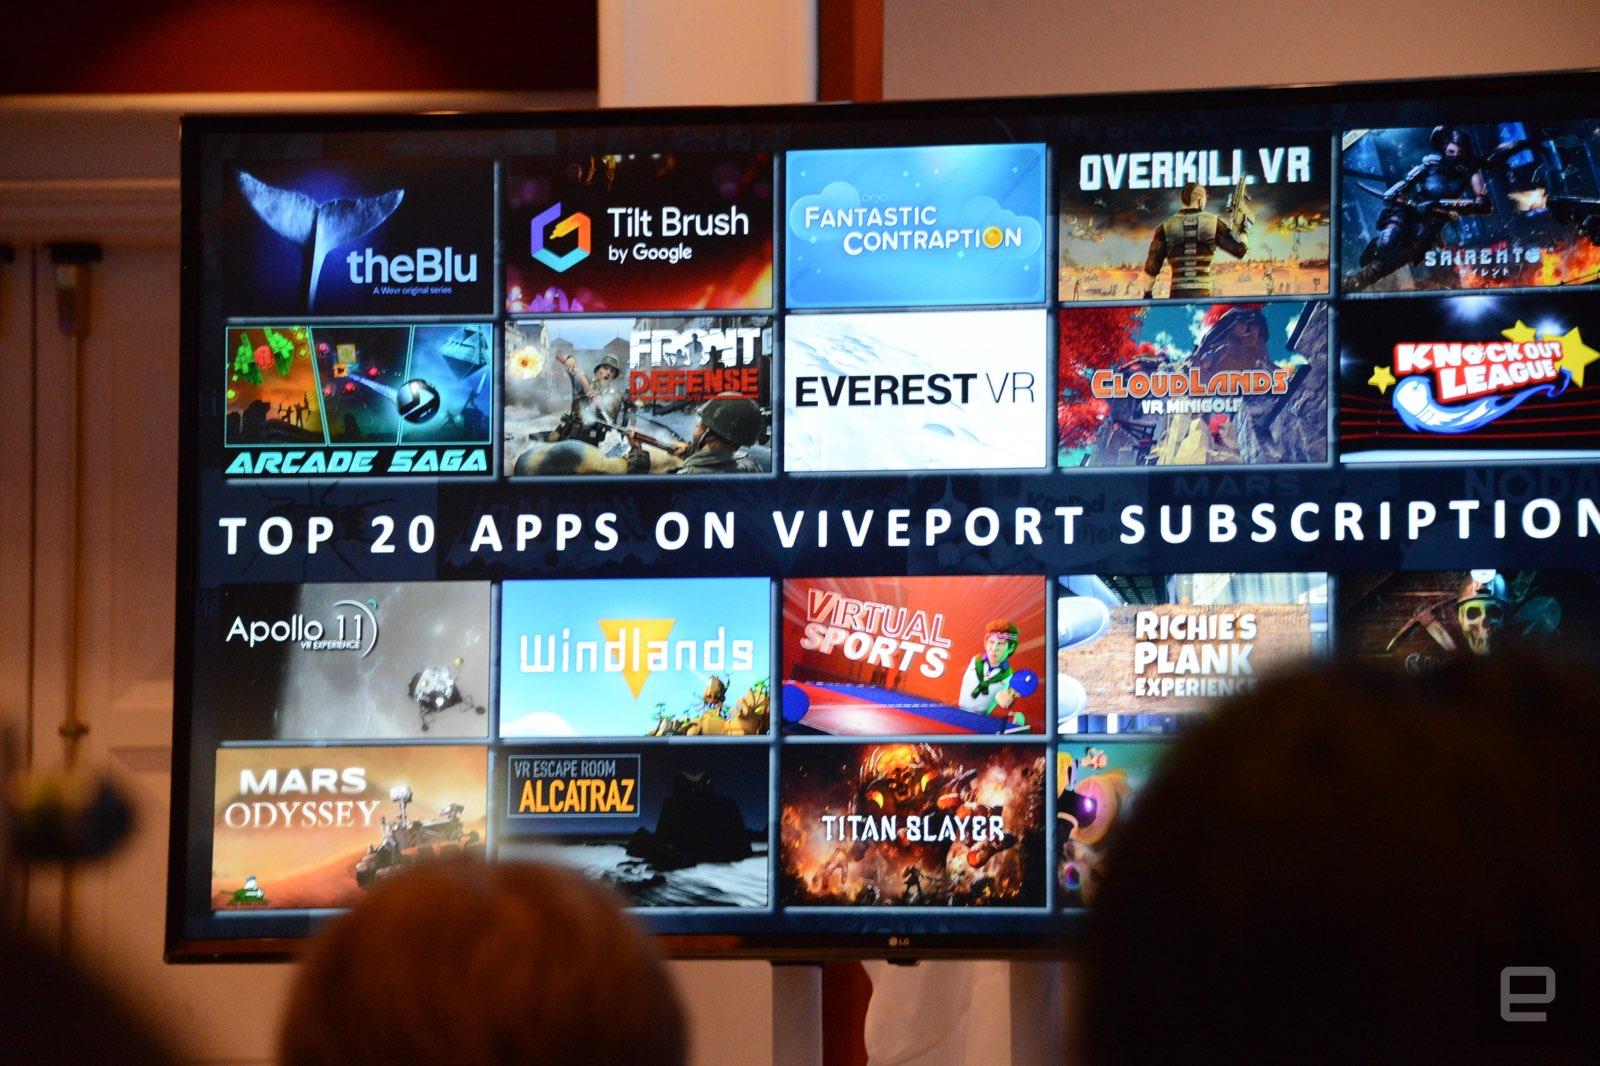 Vive at CES 2018 announces a new Vive Pro headset, Vive Wireless